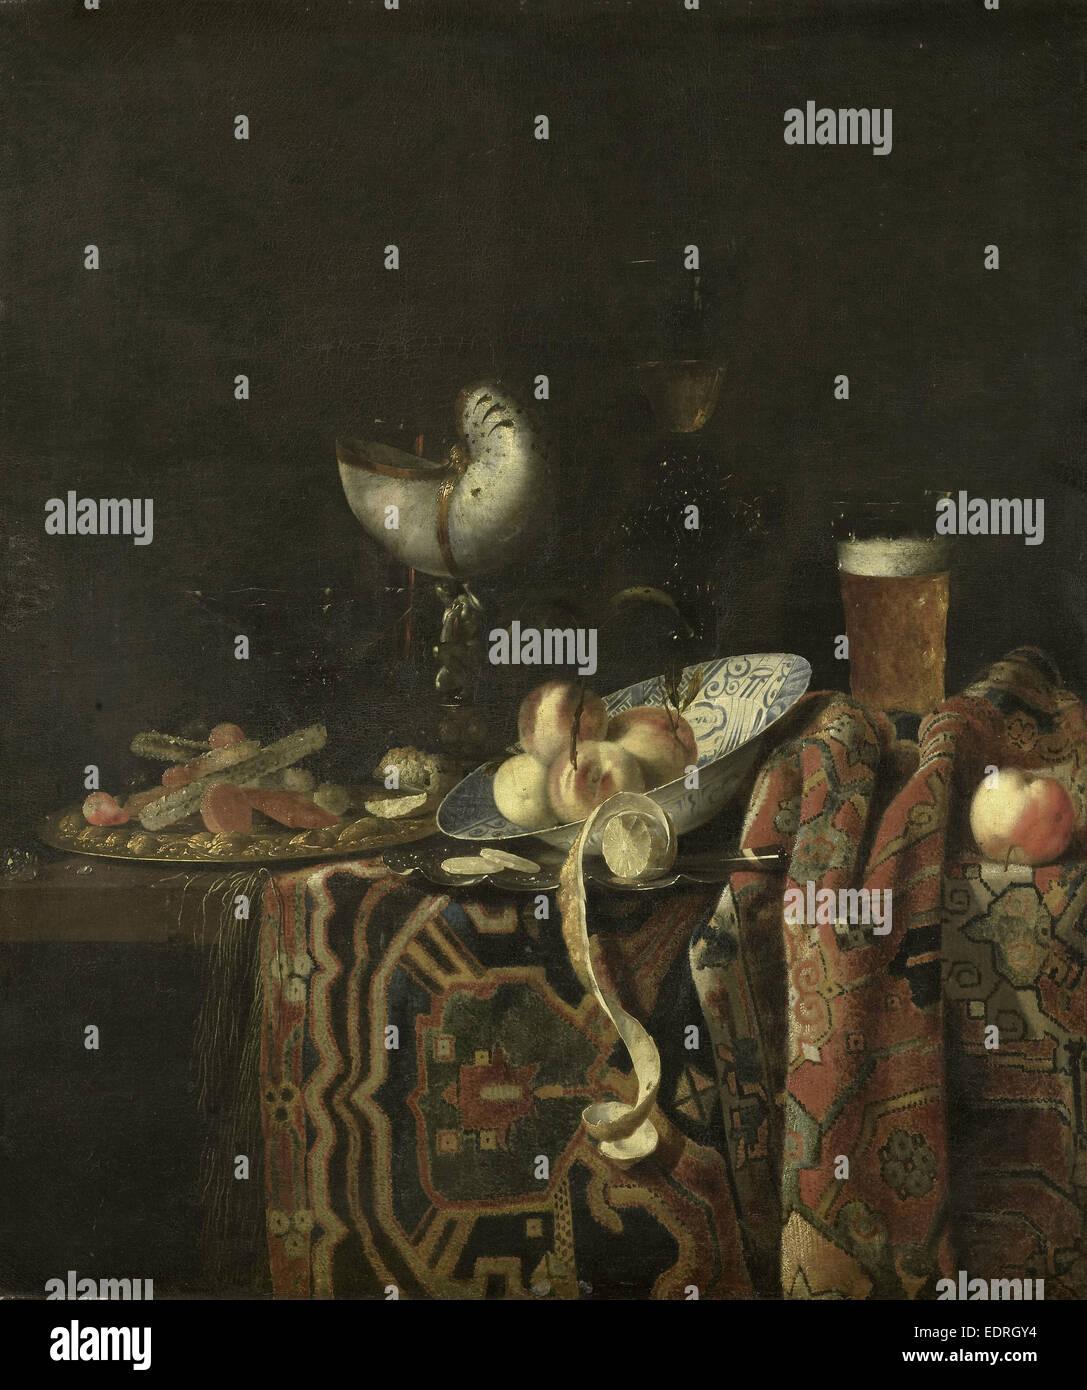 Still Life, Georg Hainz, 1666 - 1700 - Stock Image